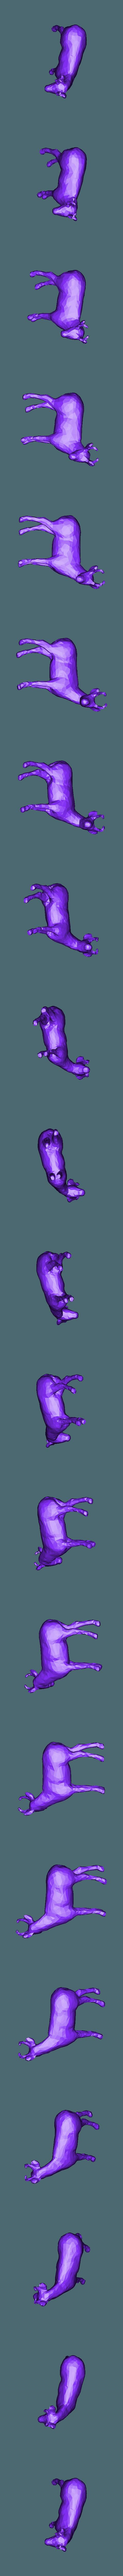 Low poly - Antilope vm.stl Download STL file Low poly - Antelope • 3D printable model, InSpace